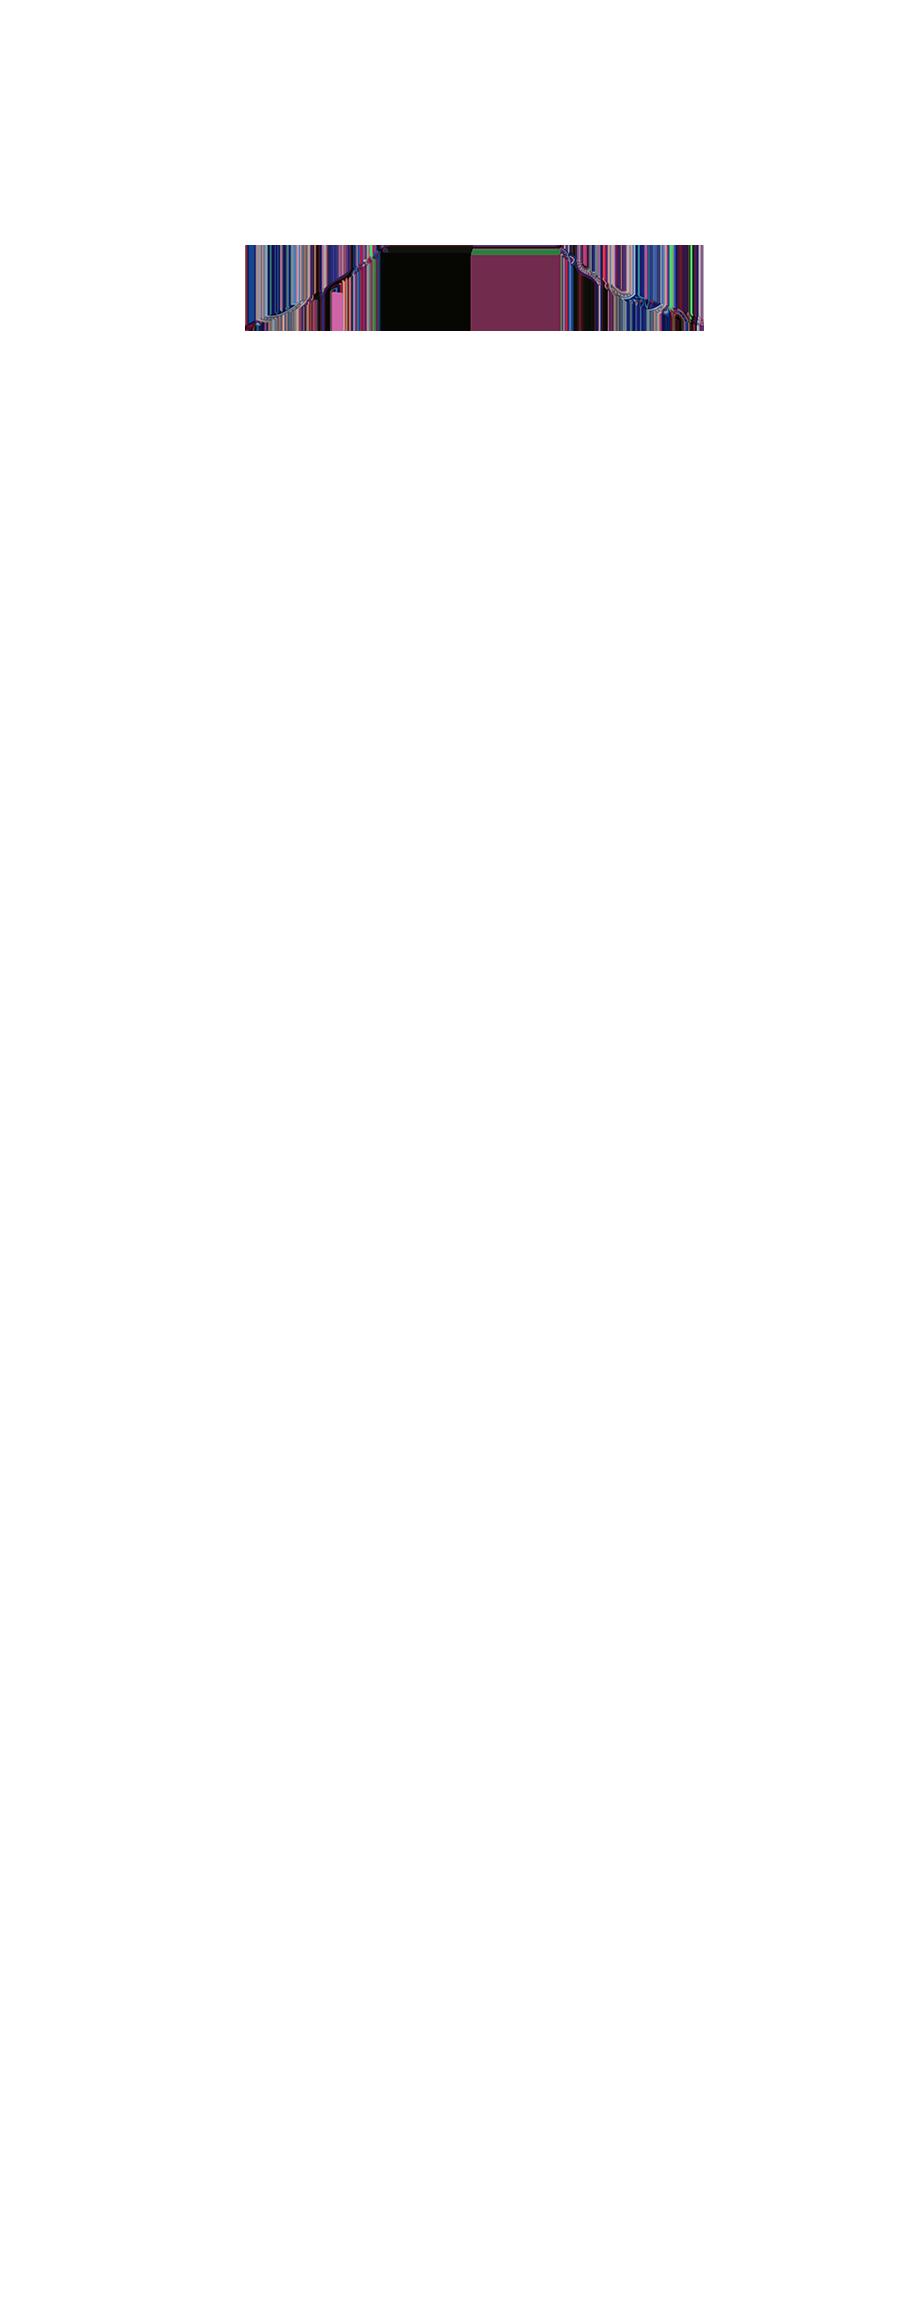 NEFL-2